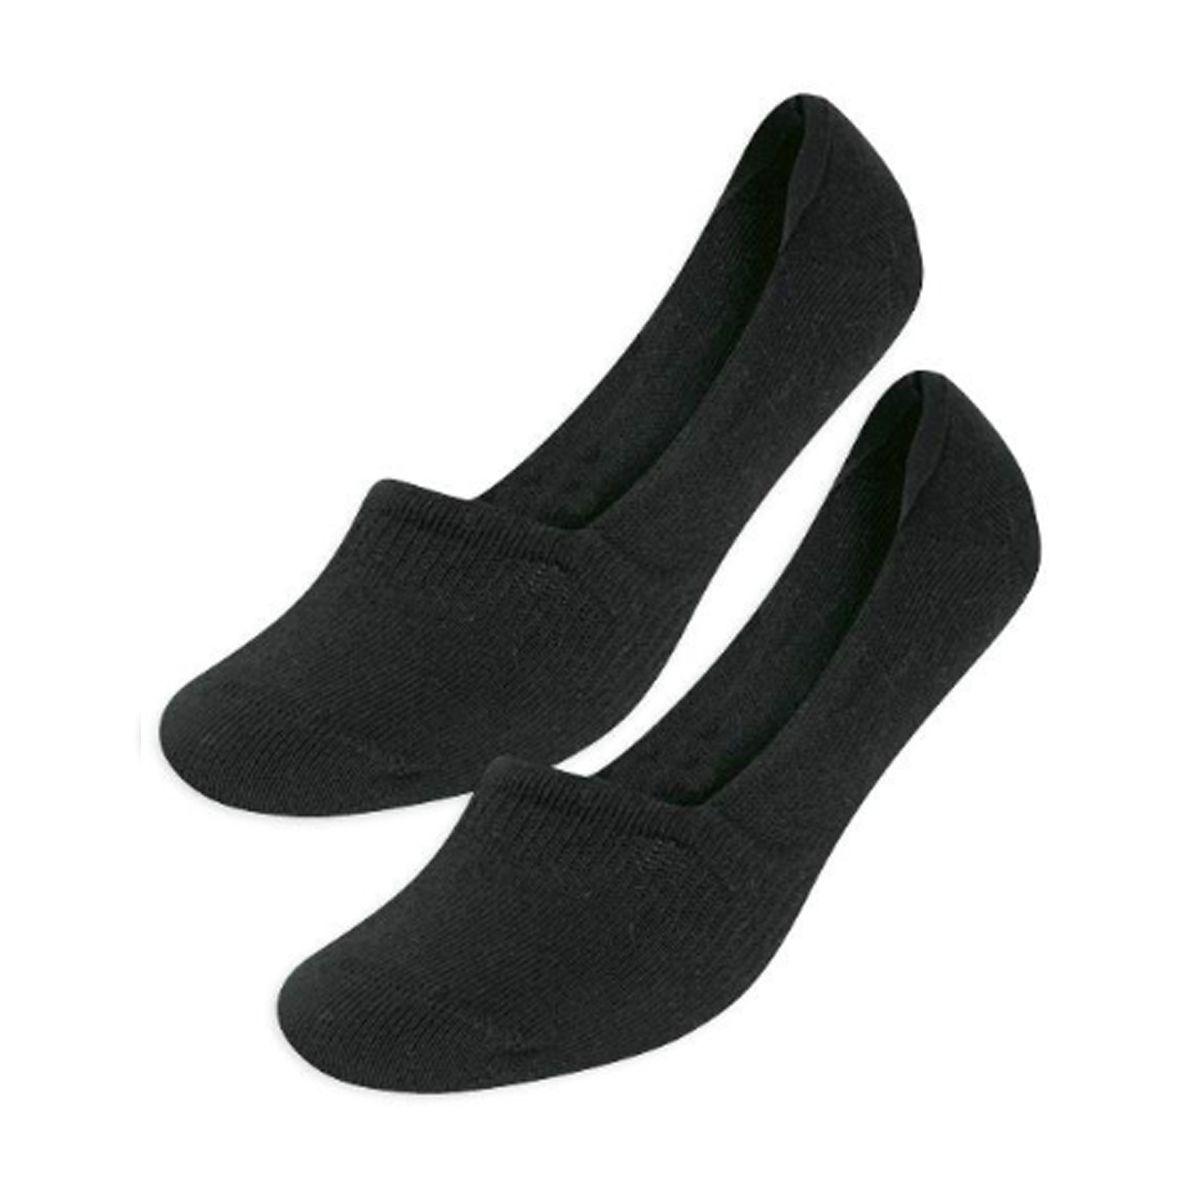 Meia masculina sapatilha invisível Selene